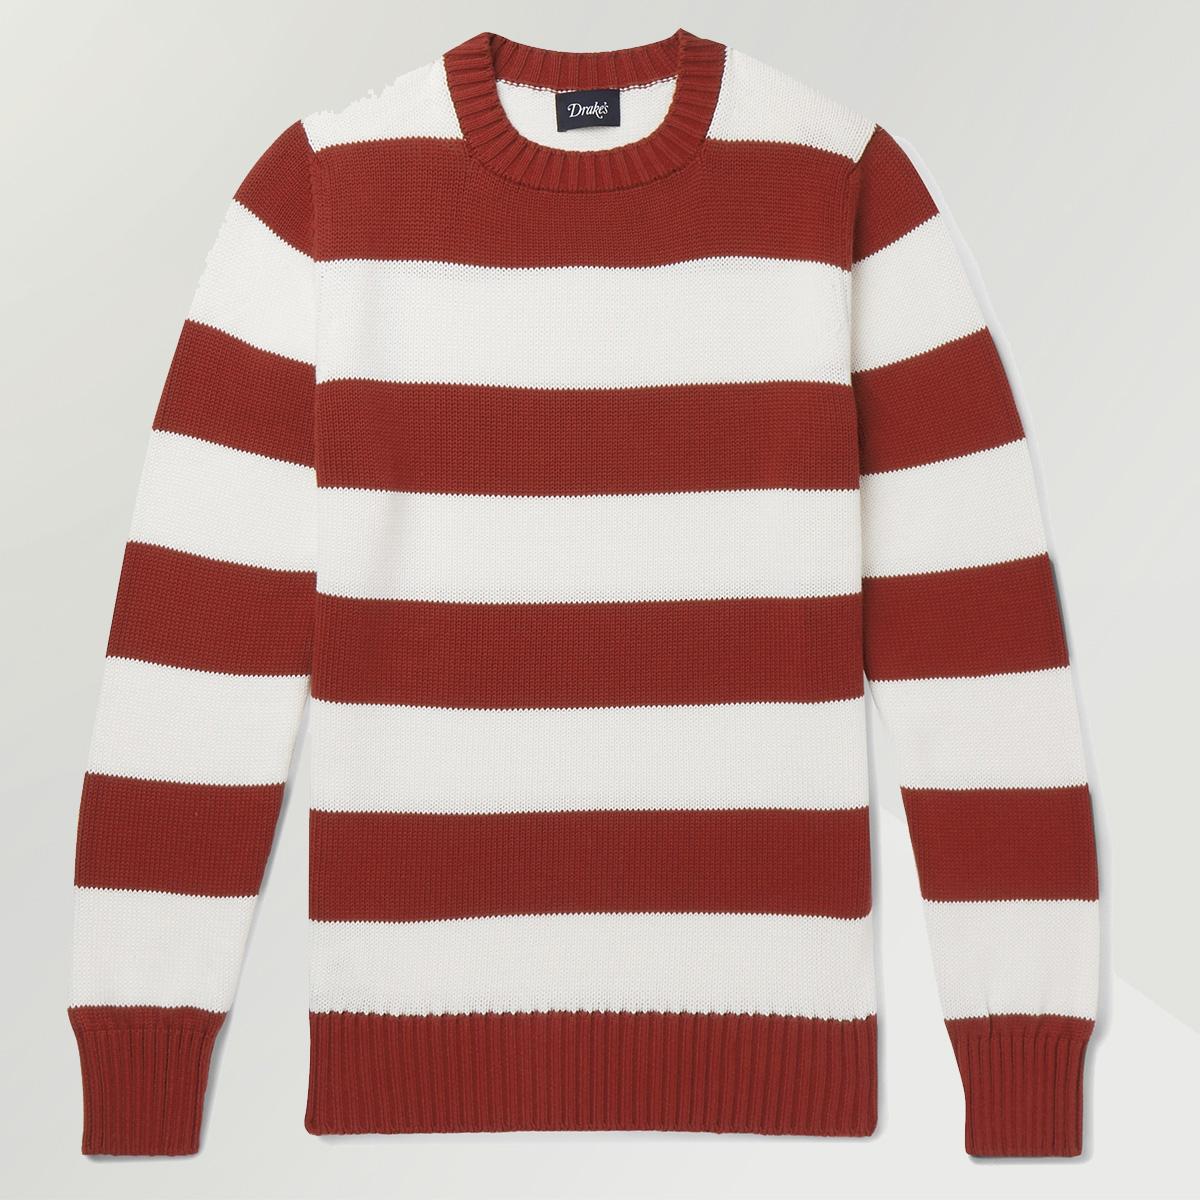 Drake's Valentine's jumper